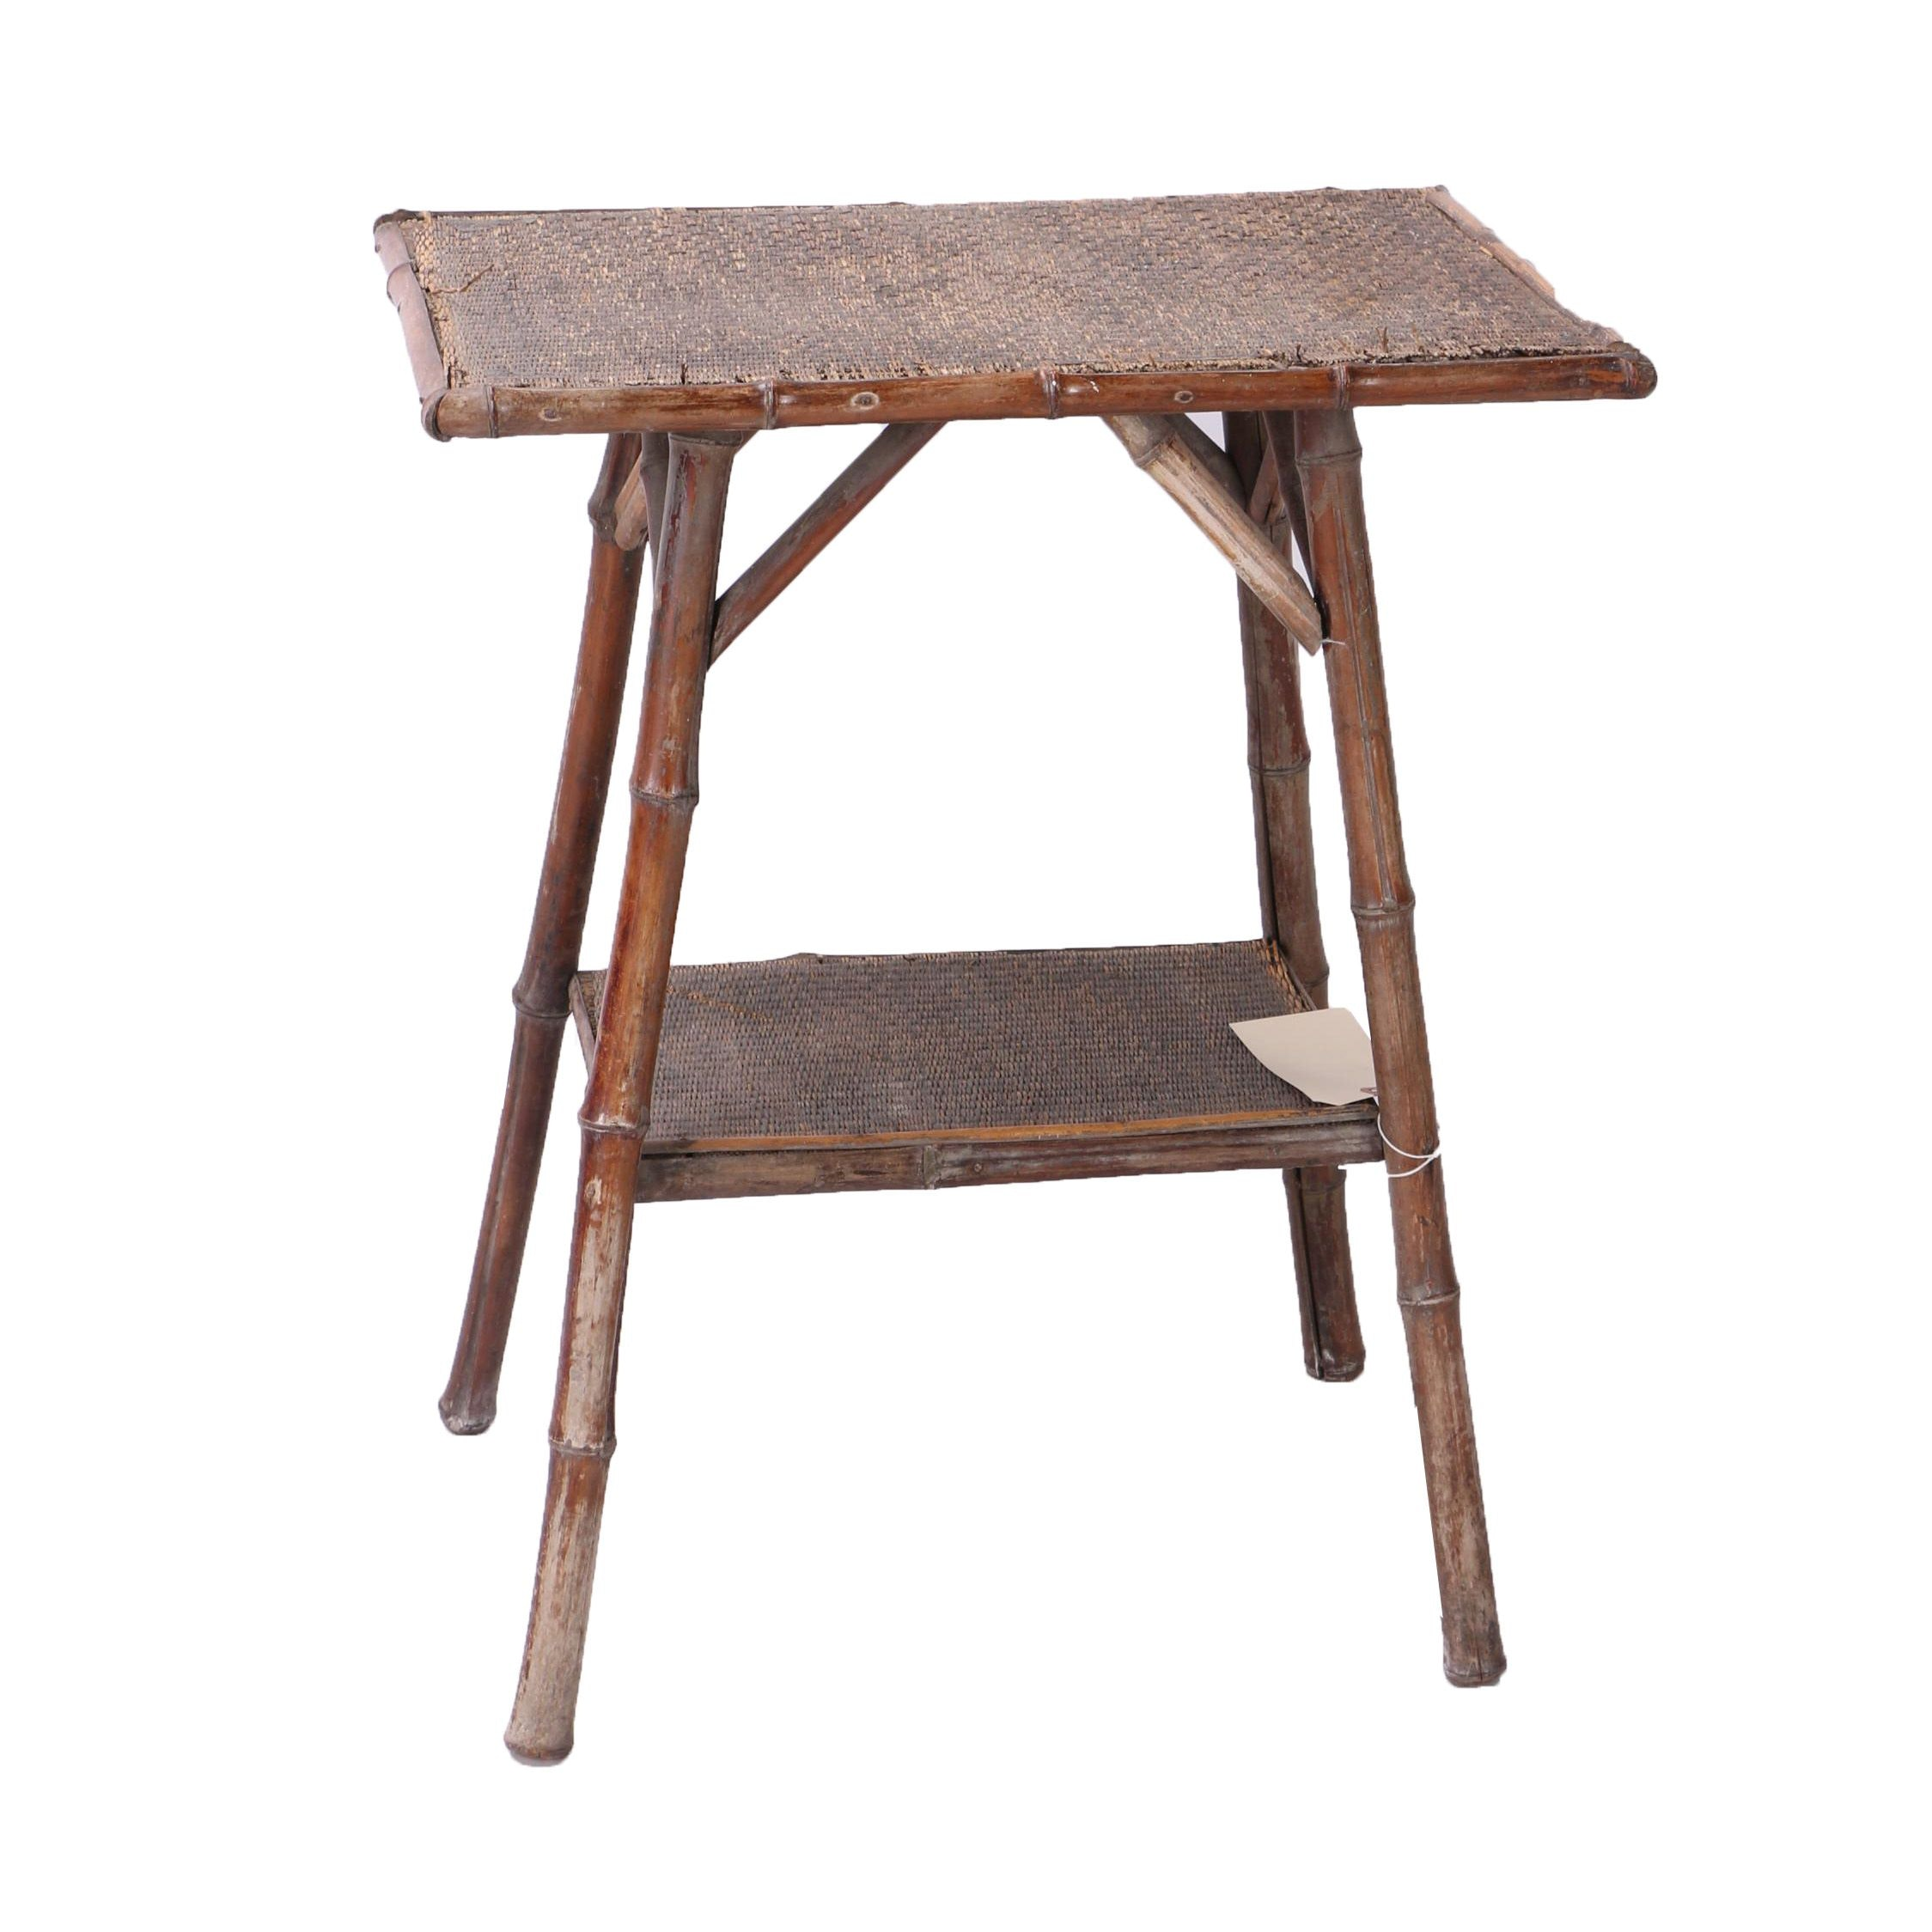 Woven Bamboo End Table